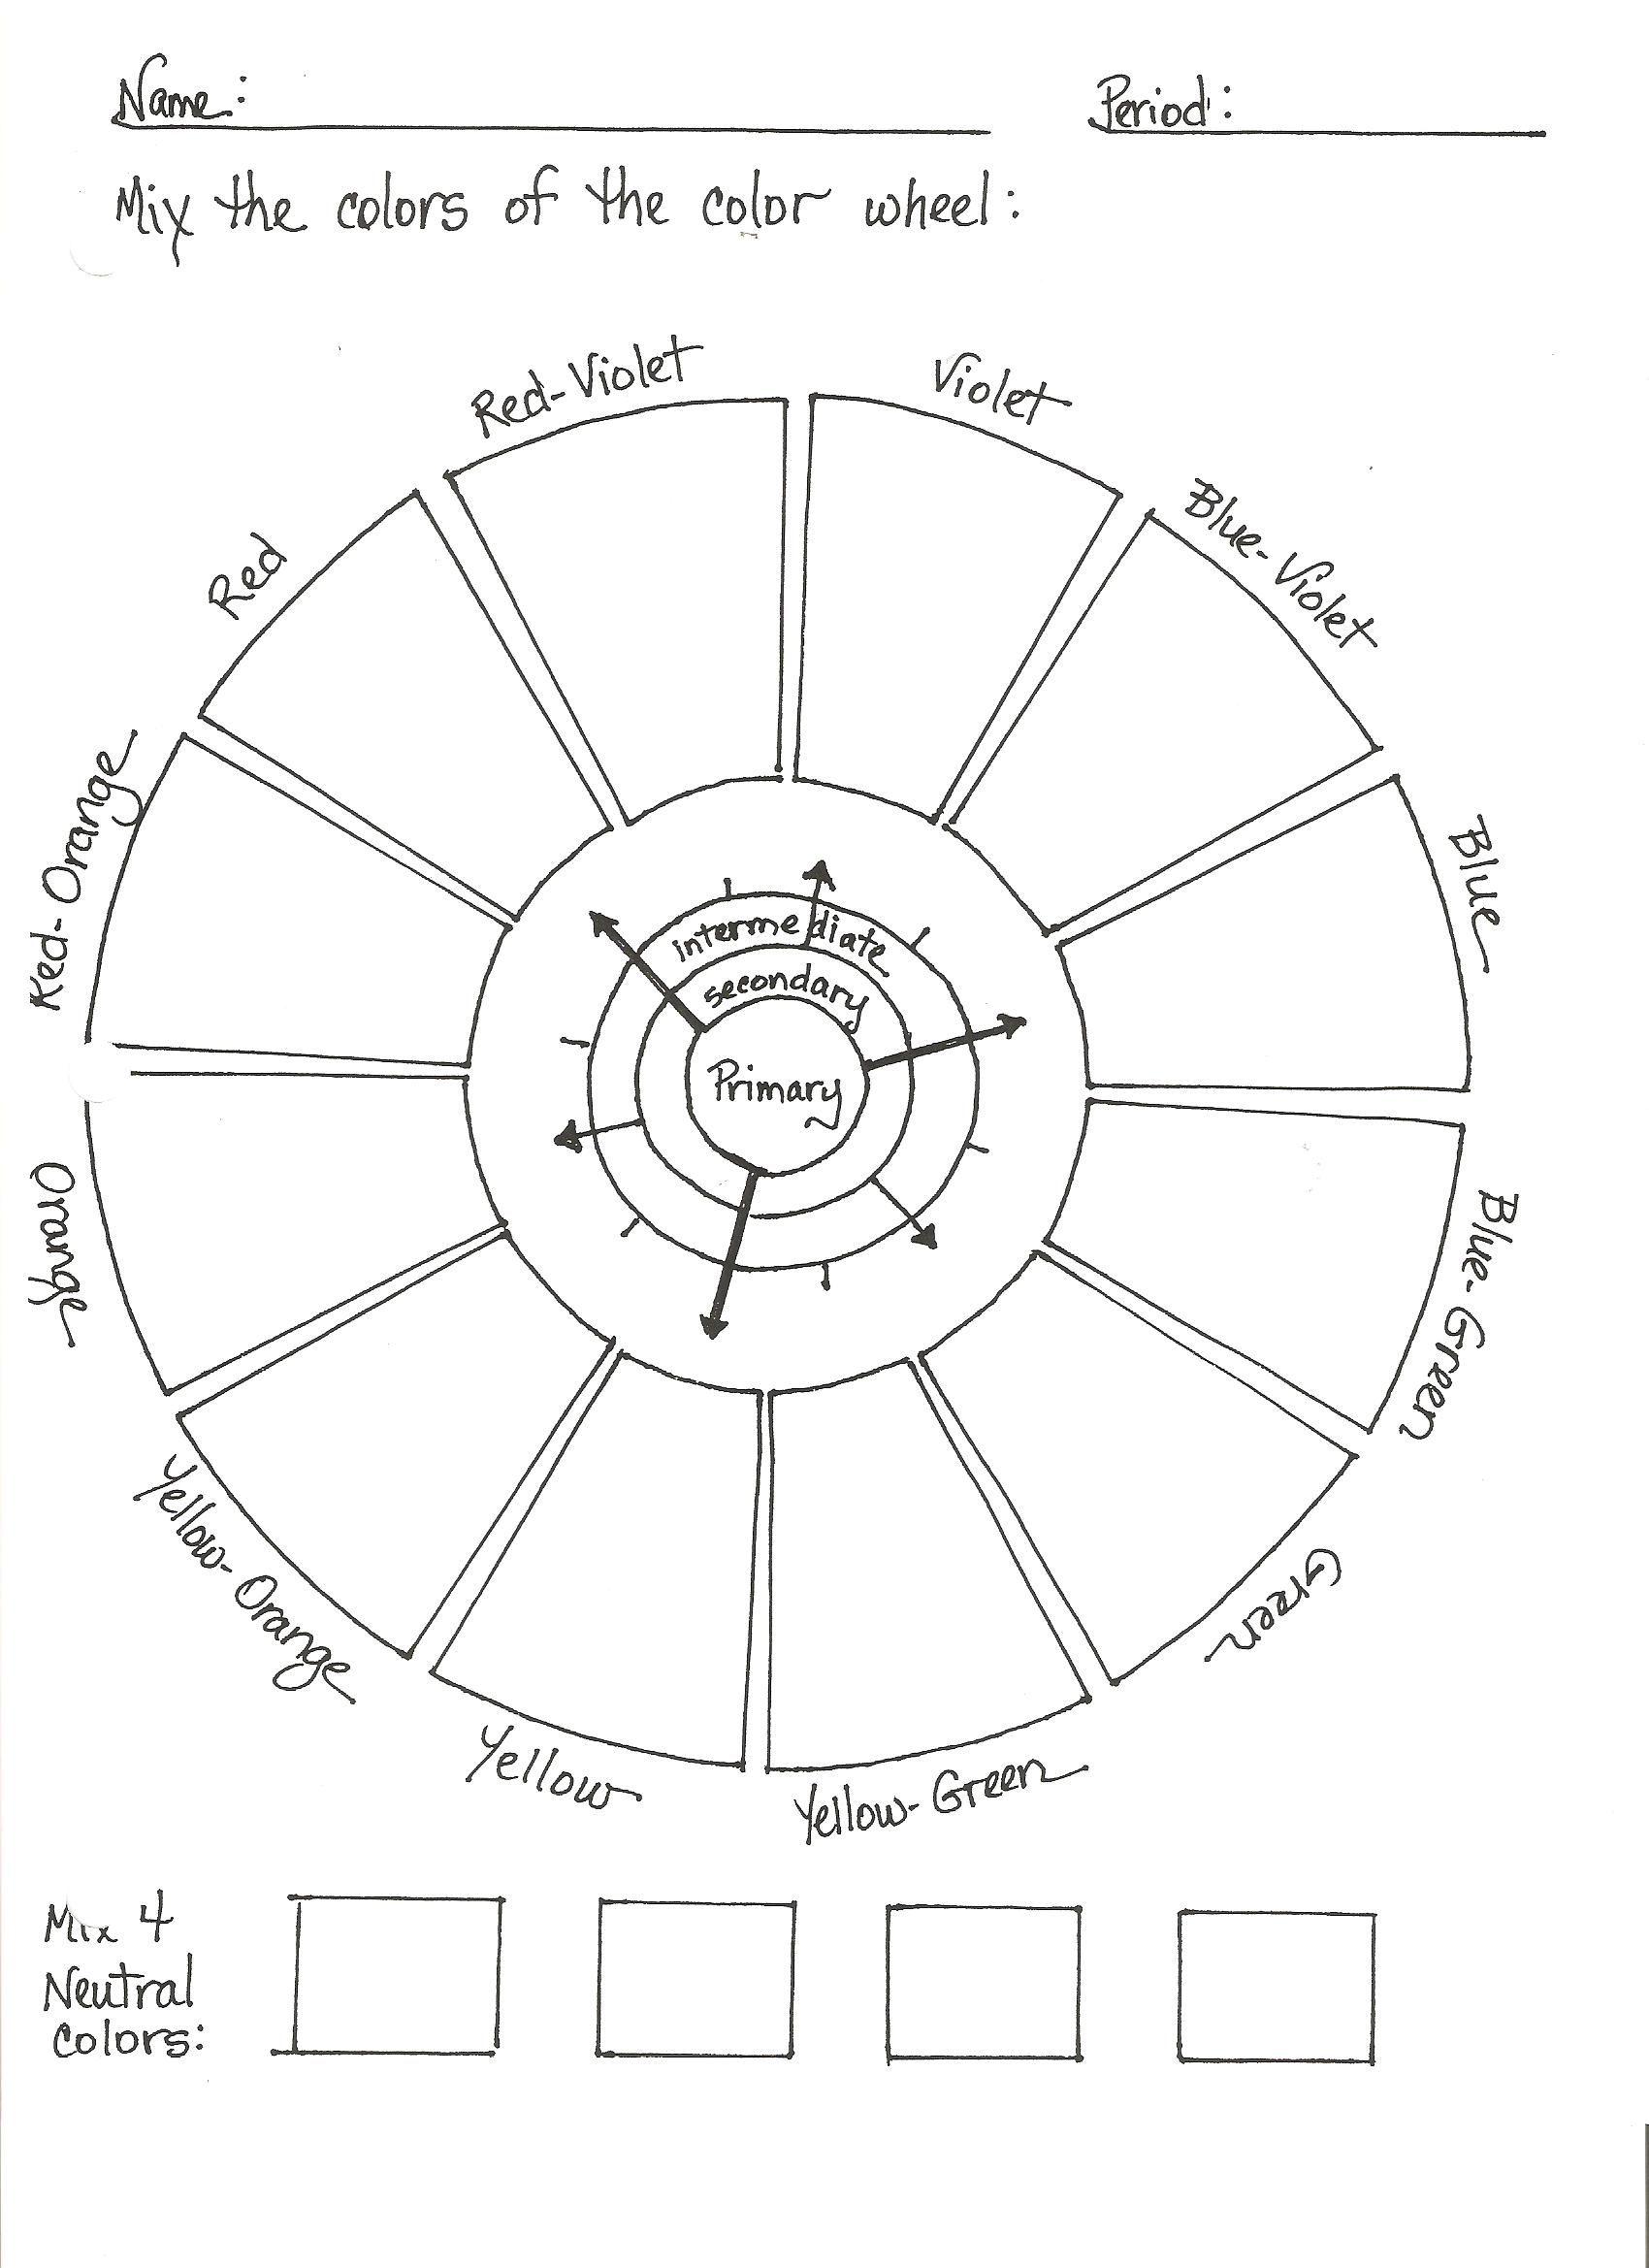 High School Color Wheel Worksheet Invitation Templates Teaching